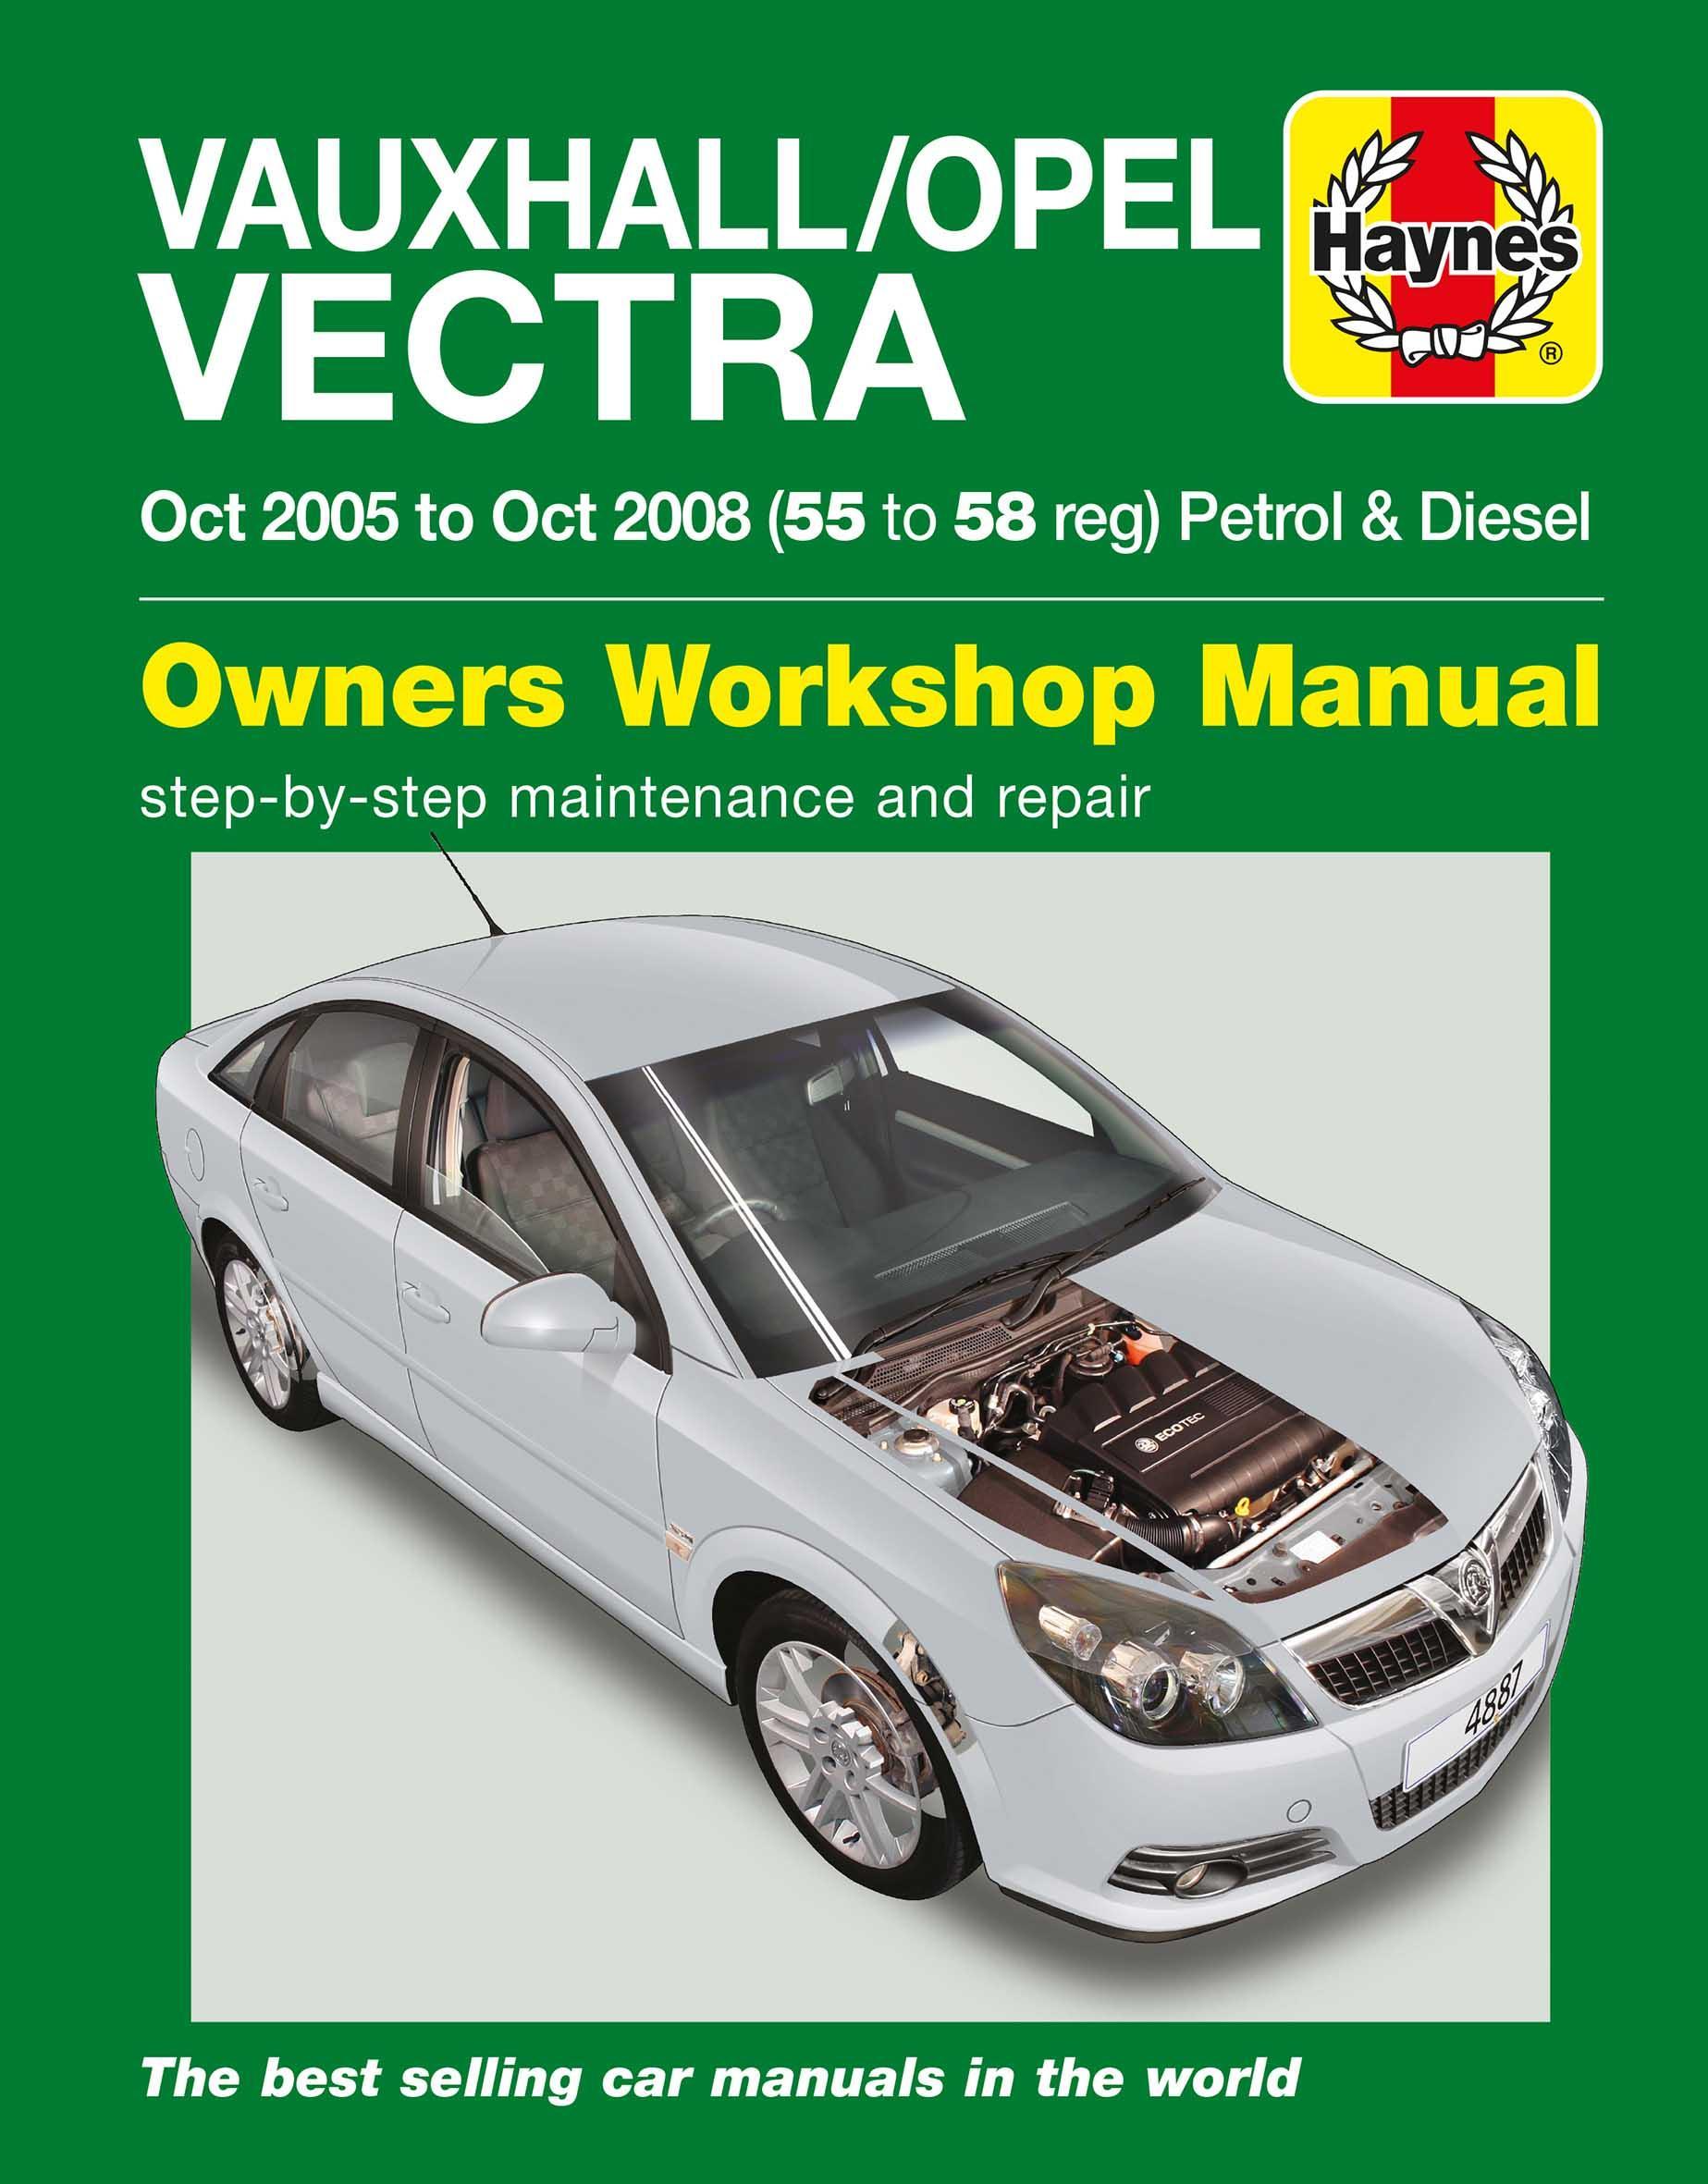 vauxhall vectra 1 8 manual free owners manual u2022 rh wordworksbysea com Vauxhall VXR8 Ford Mondeo